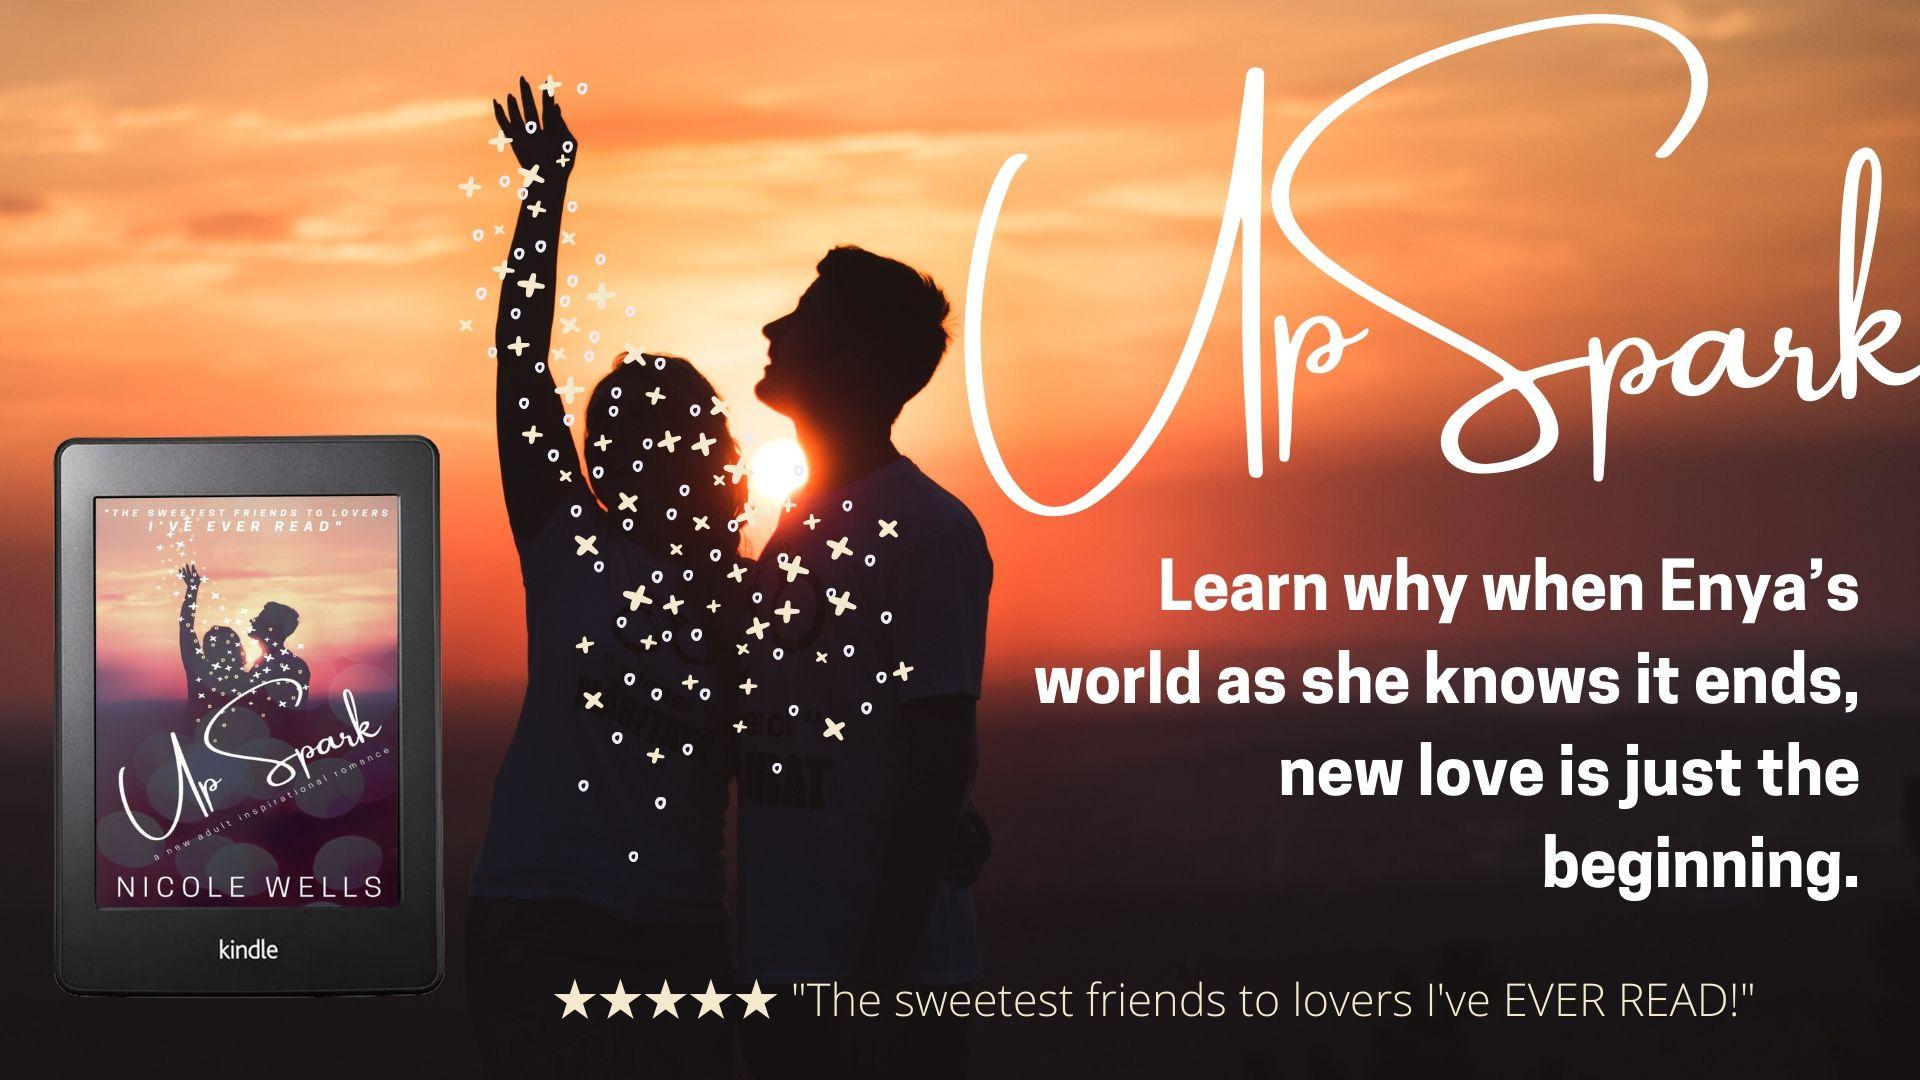 UpSpark promo release banner